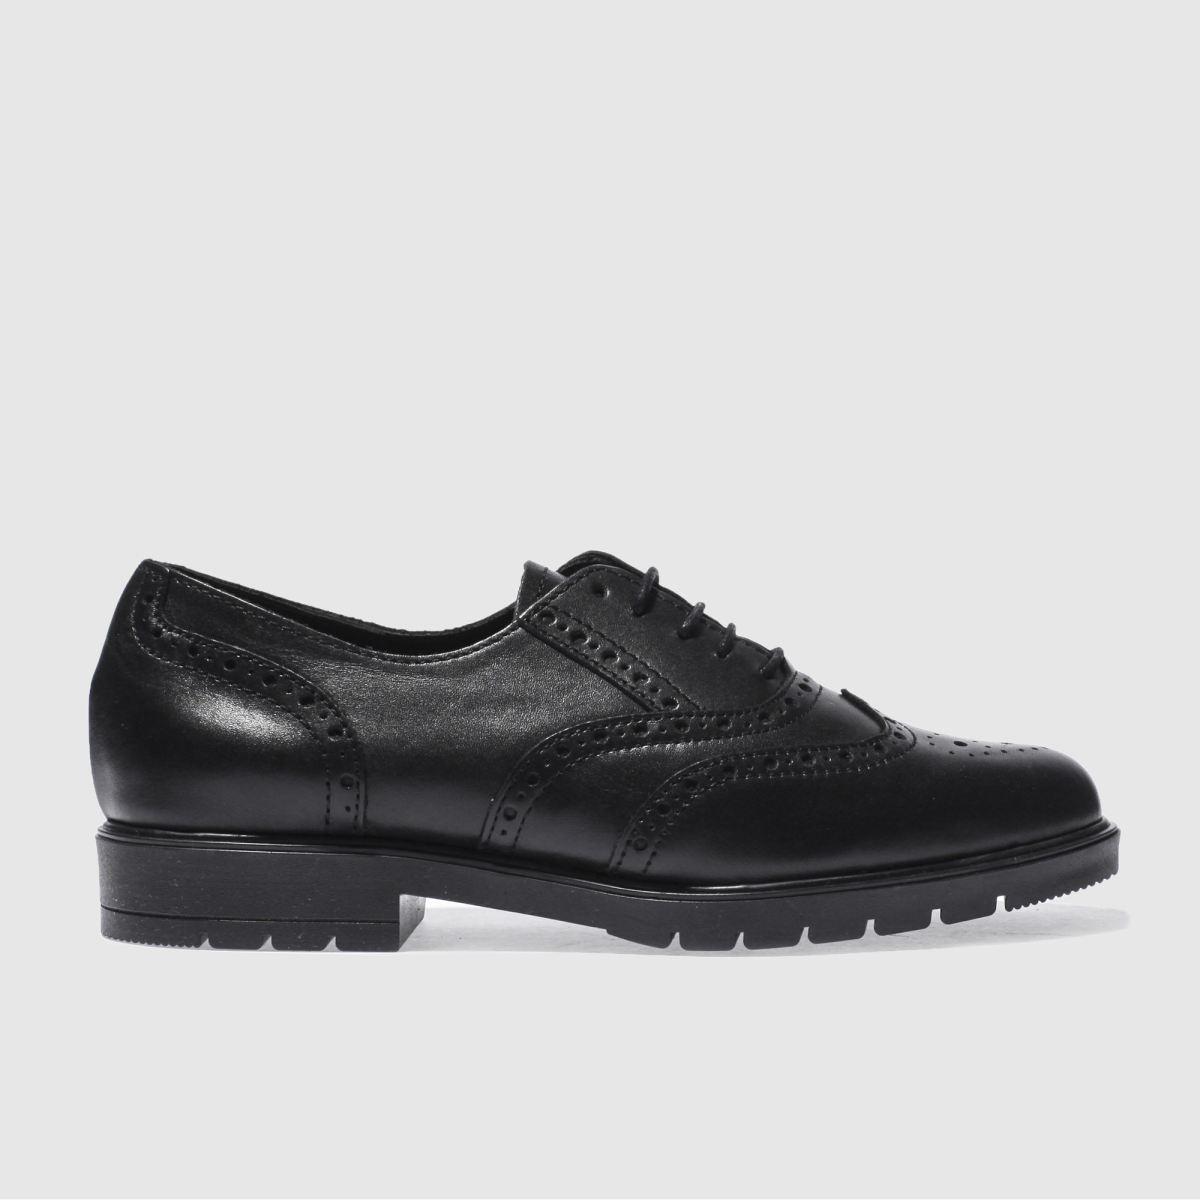 schuh black house party flat shoes